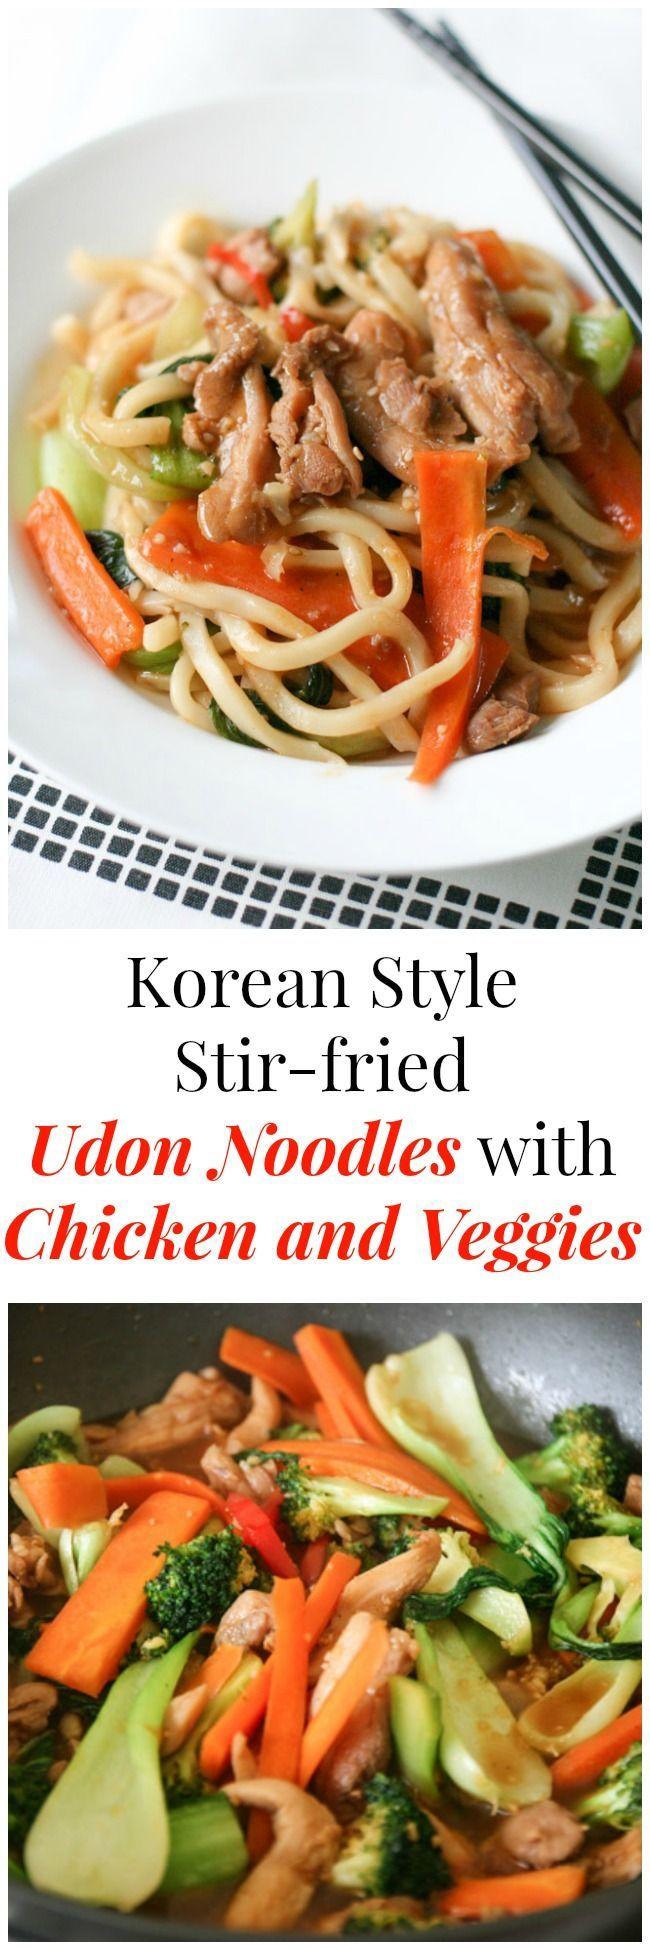 106 best Food images on Pinterest